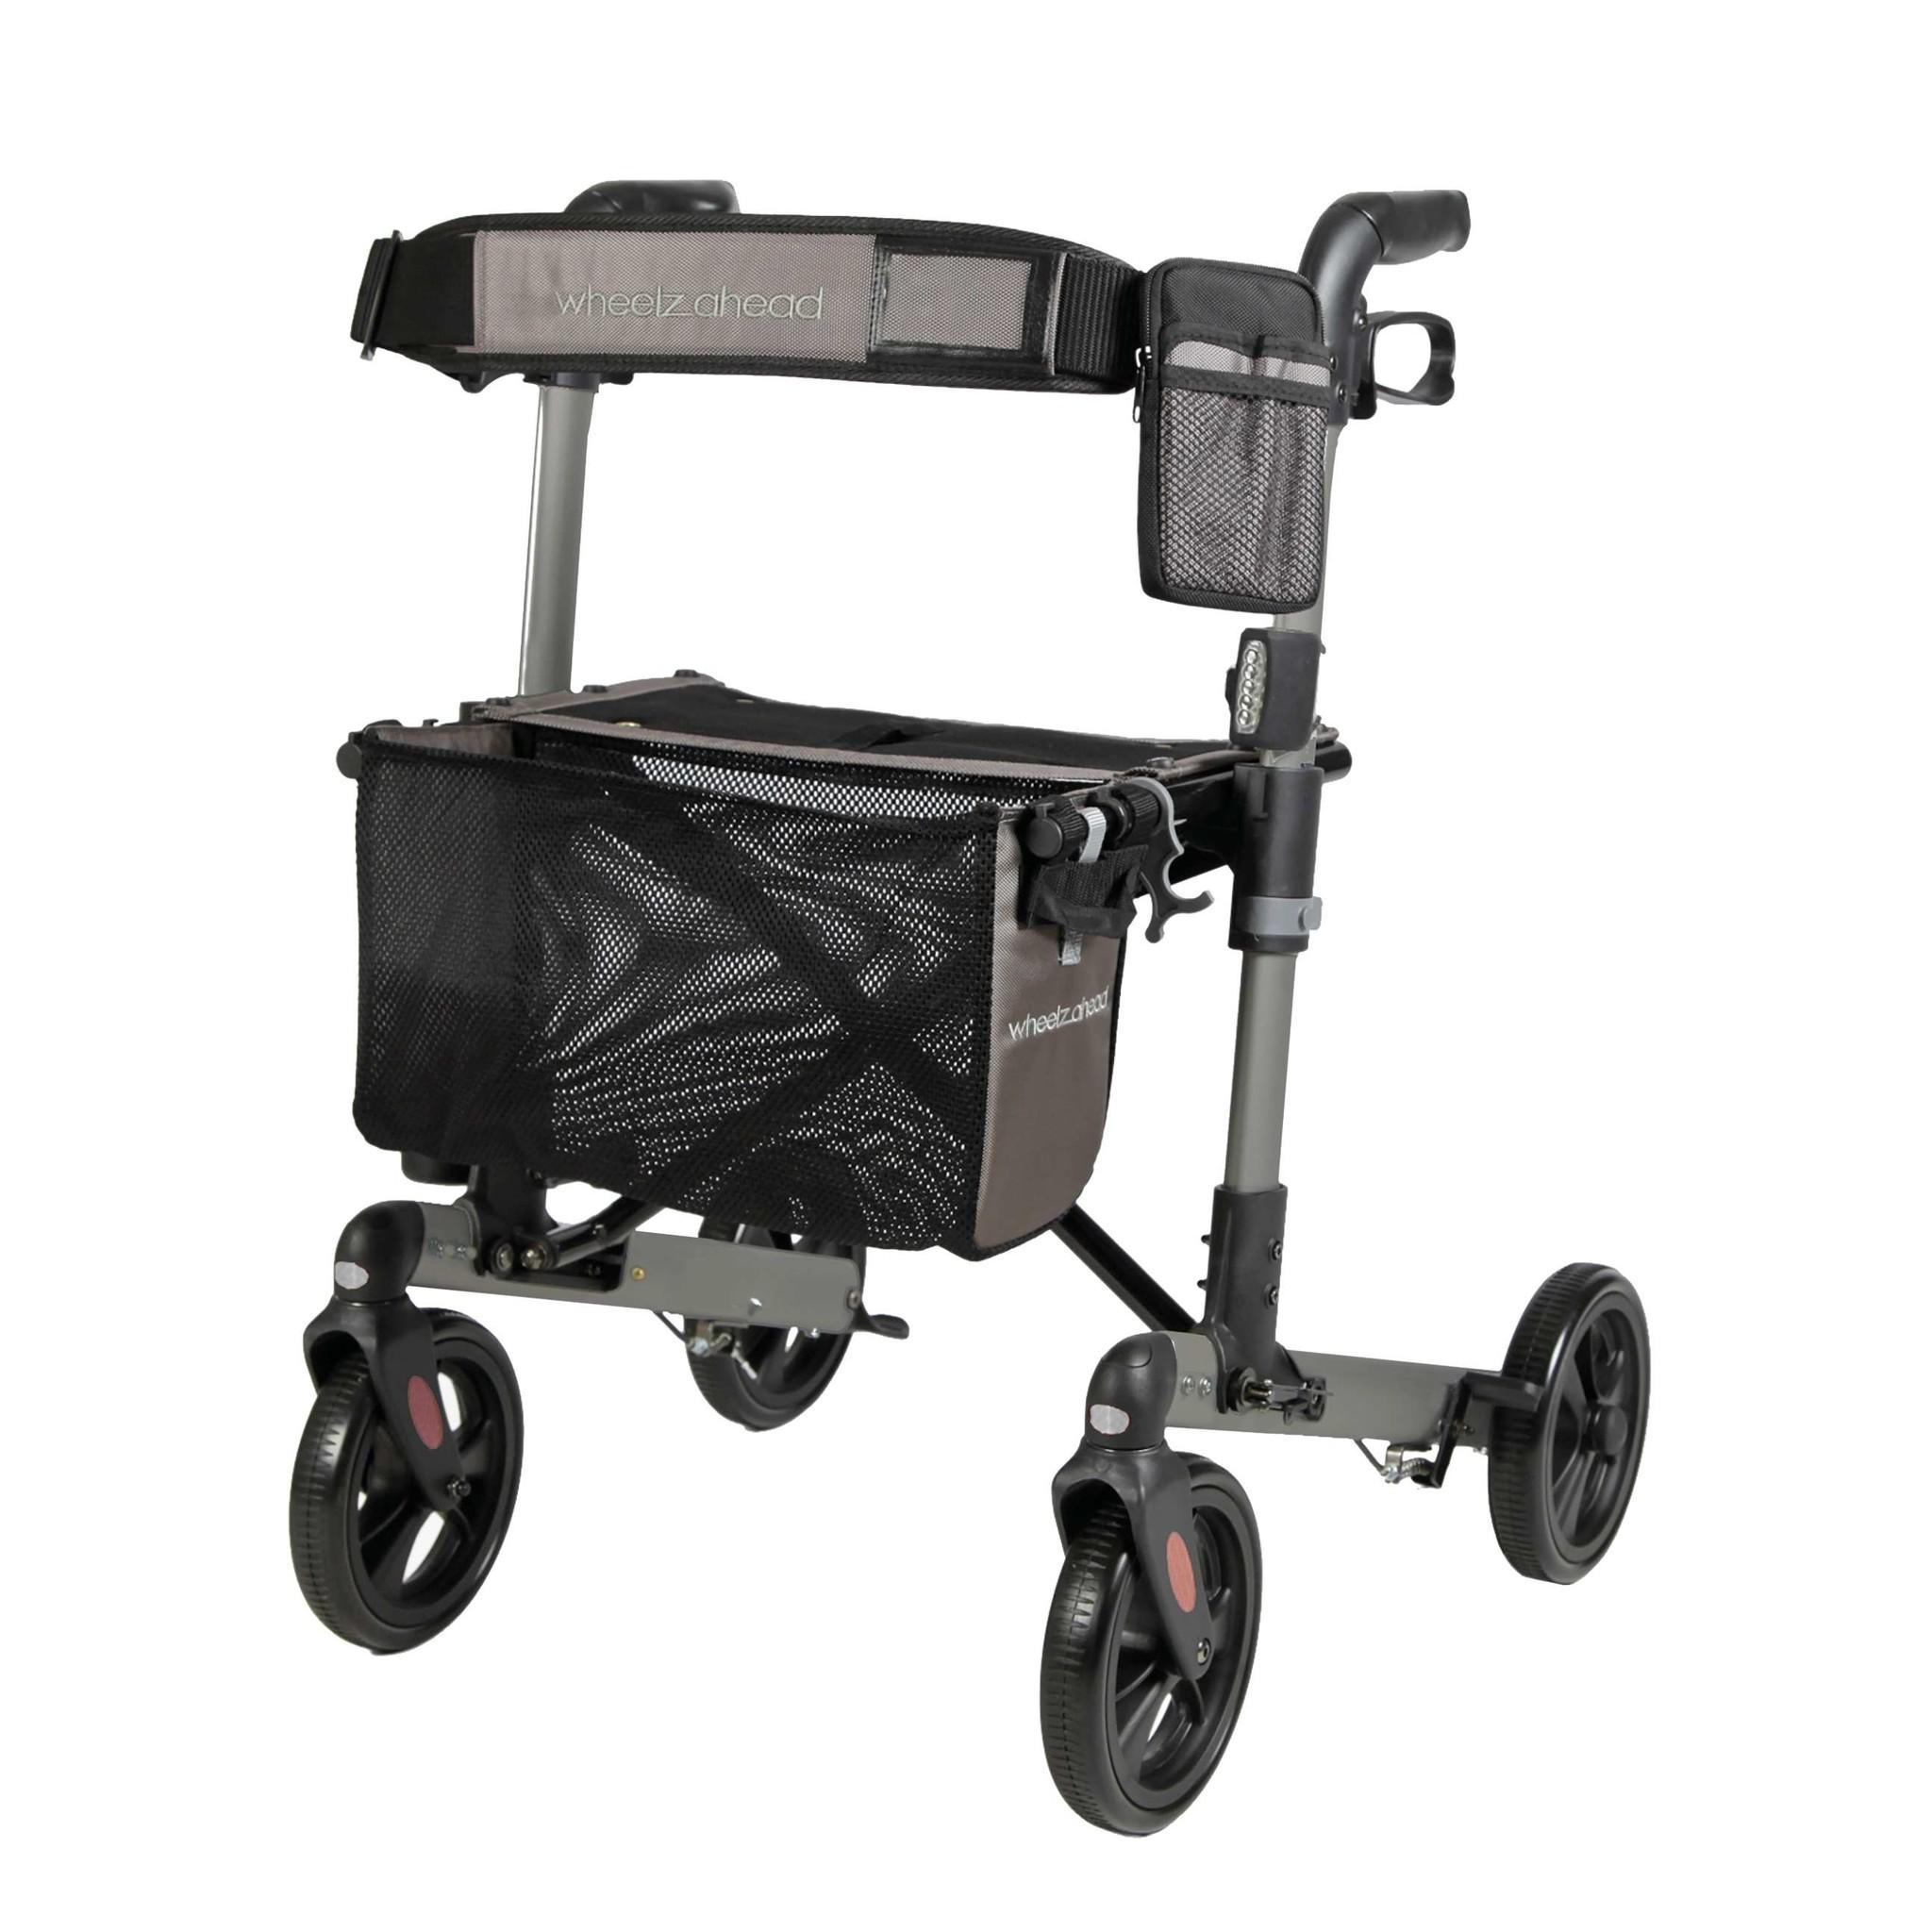 Wheelzahead Net-tas TRACK